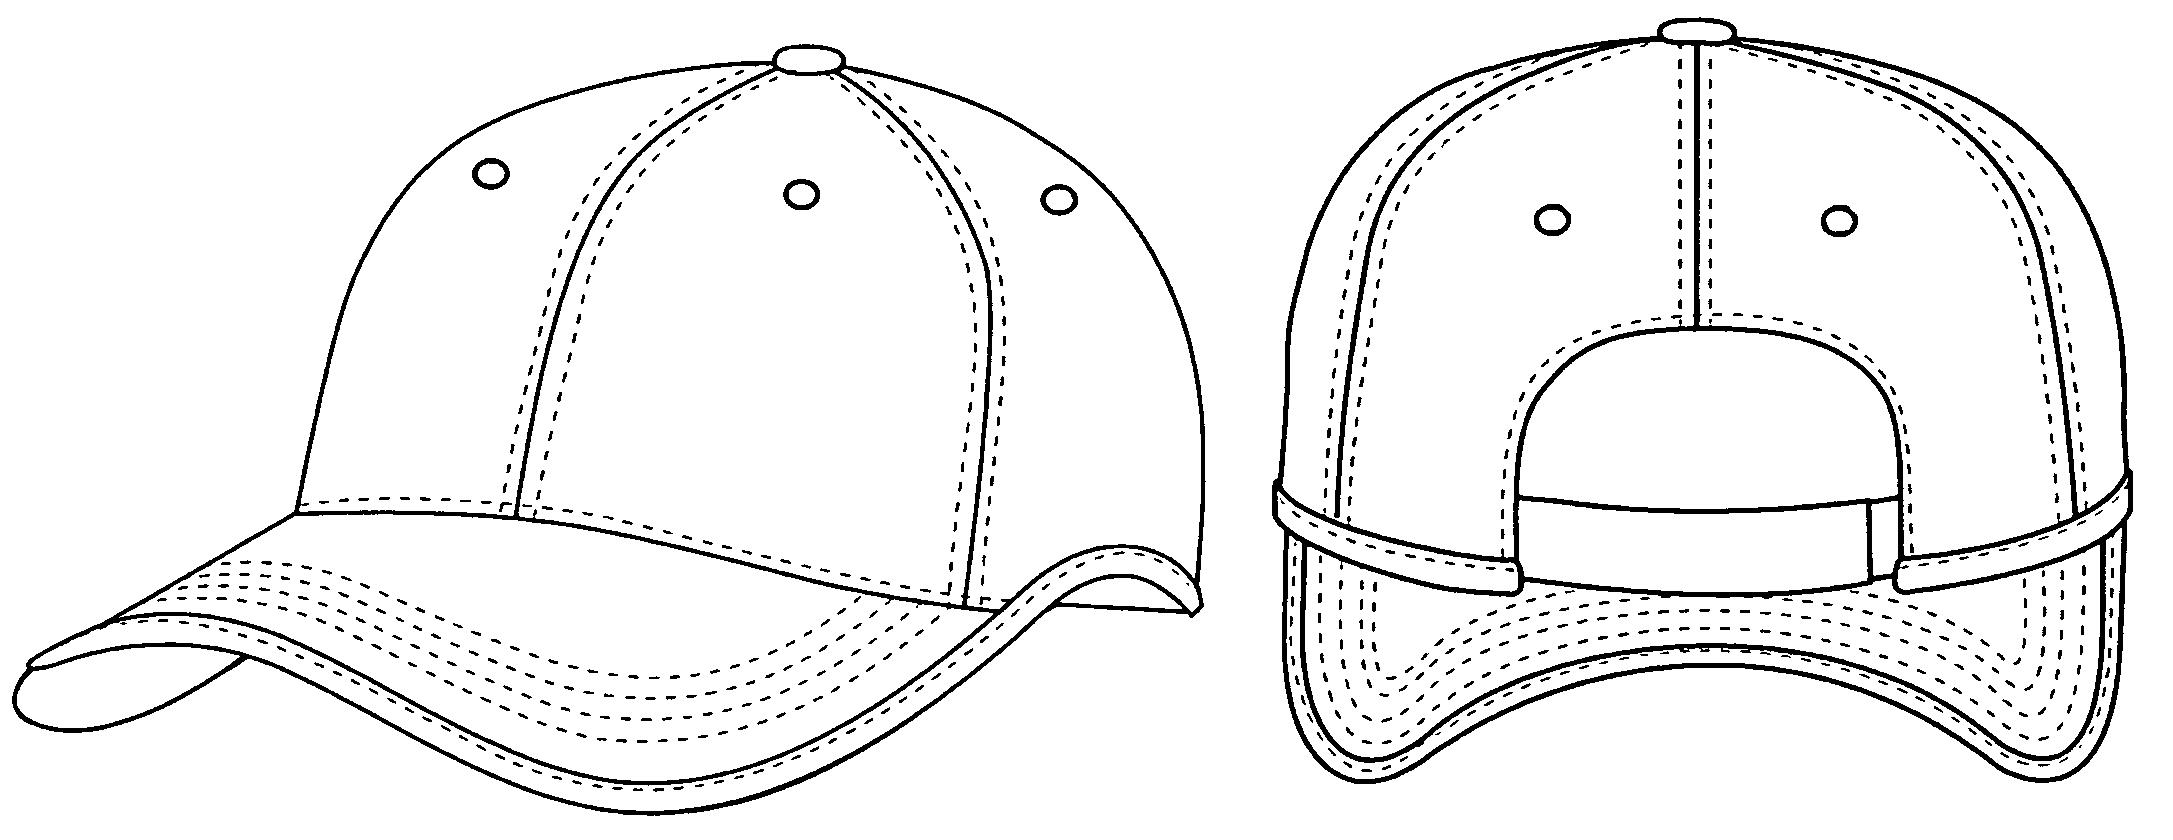 patent usd641961 baseball cap patents